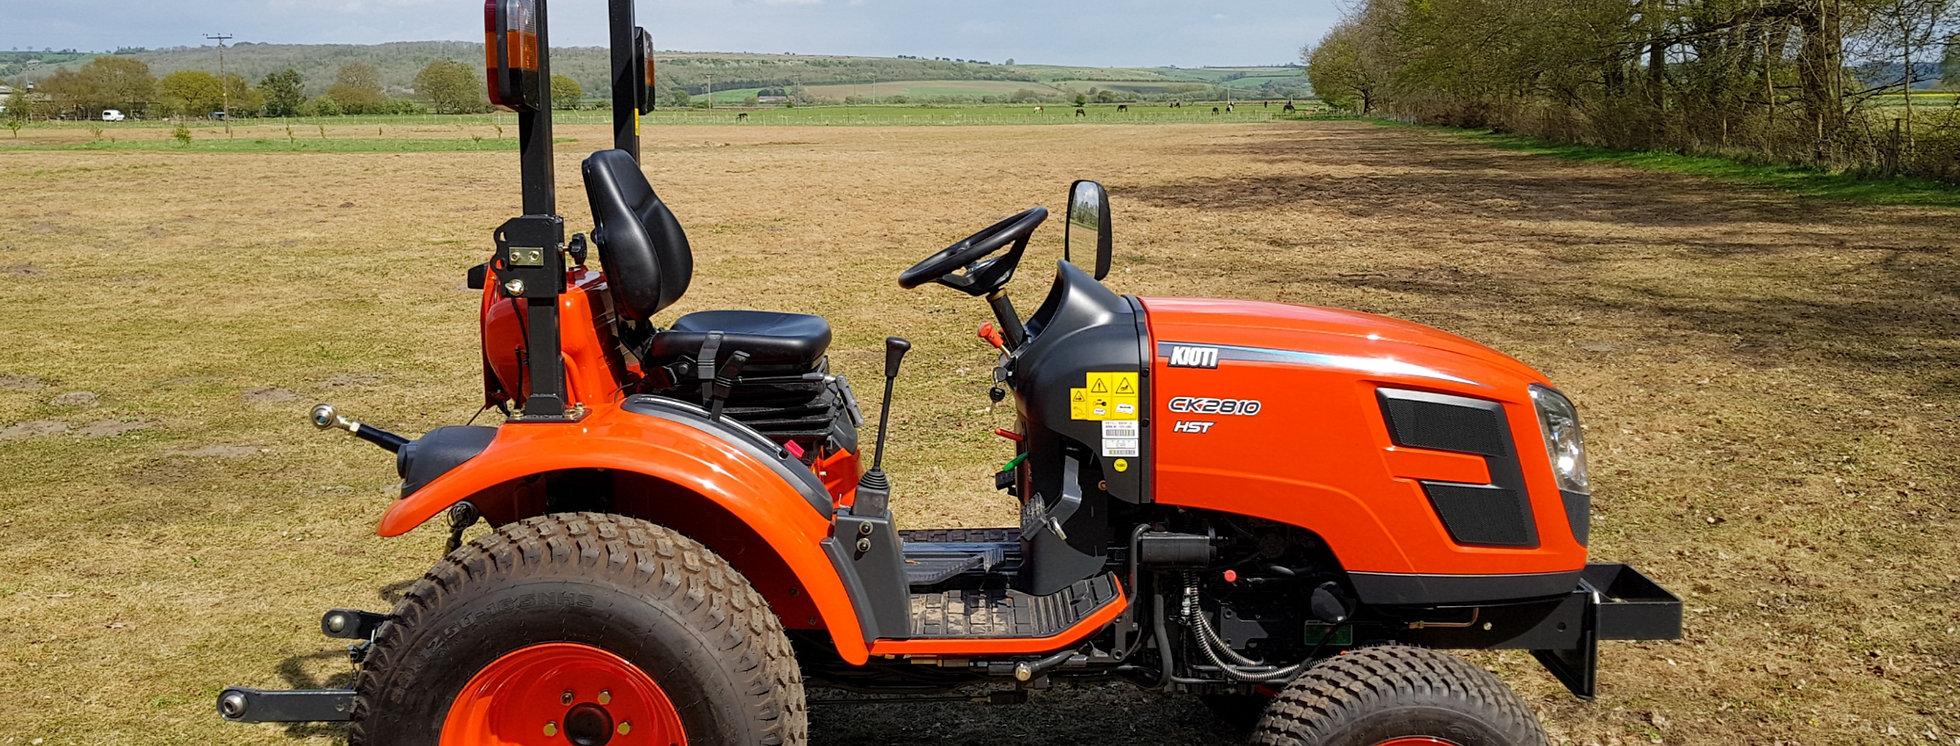 Kioti 28 hp tractor